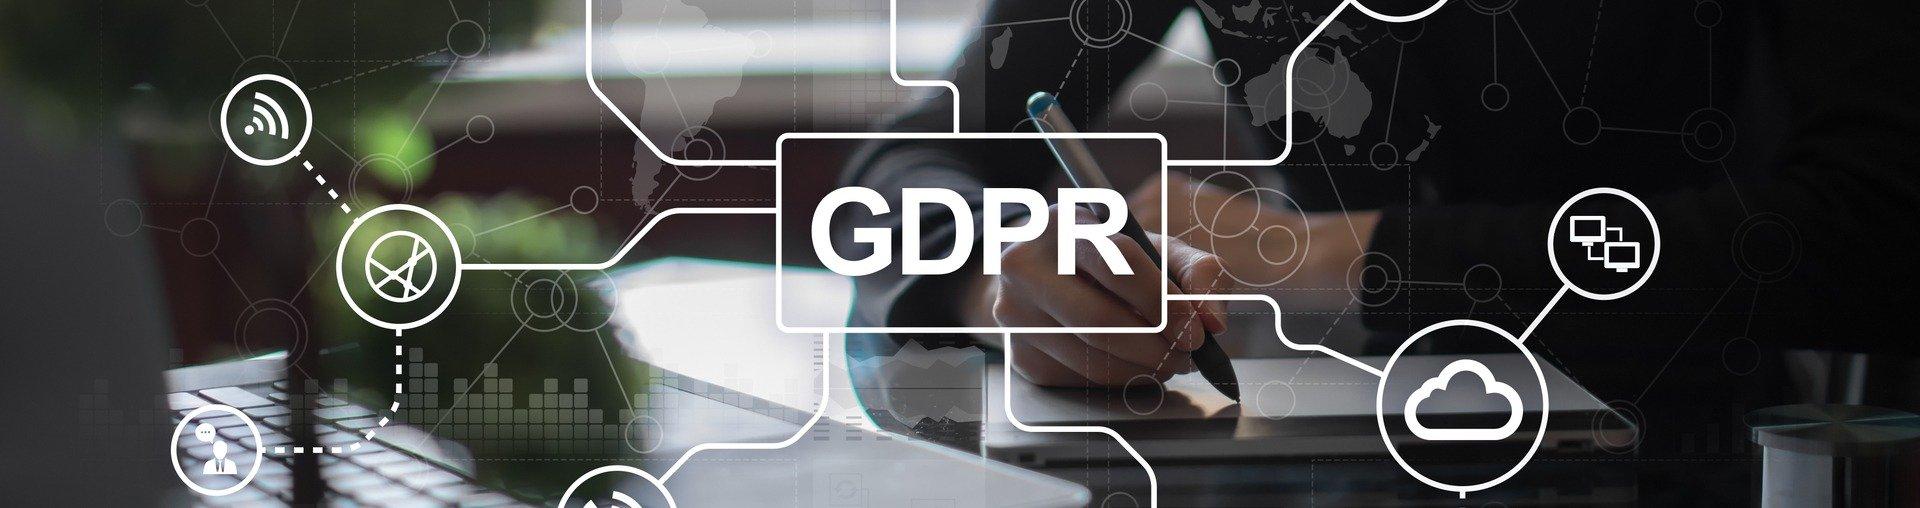 GDPR date personale 2018